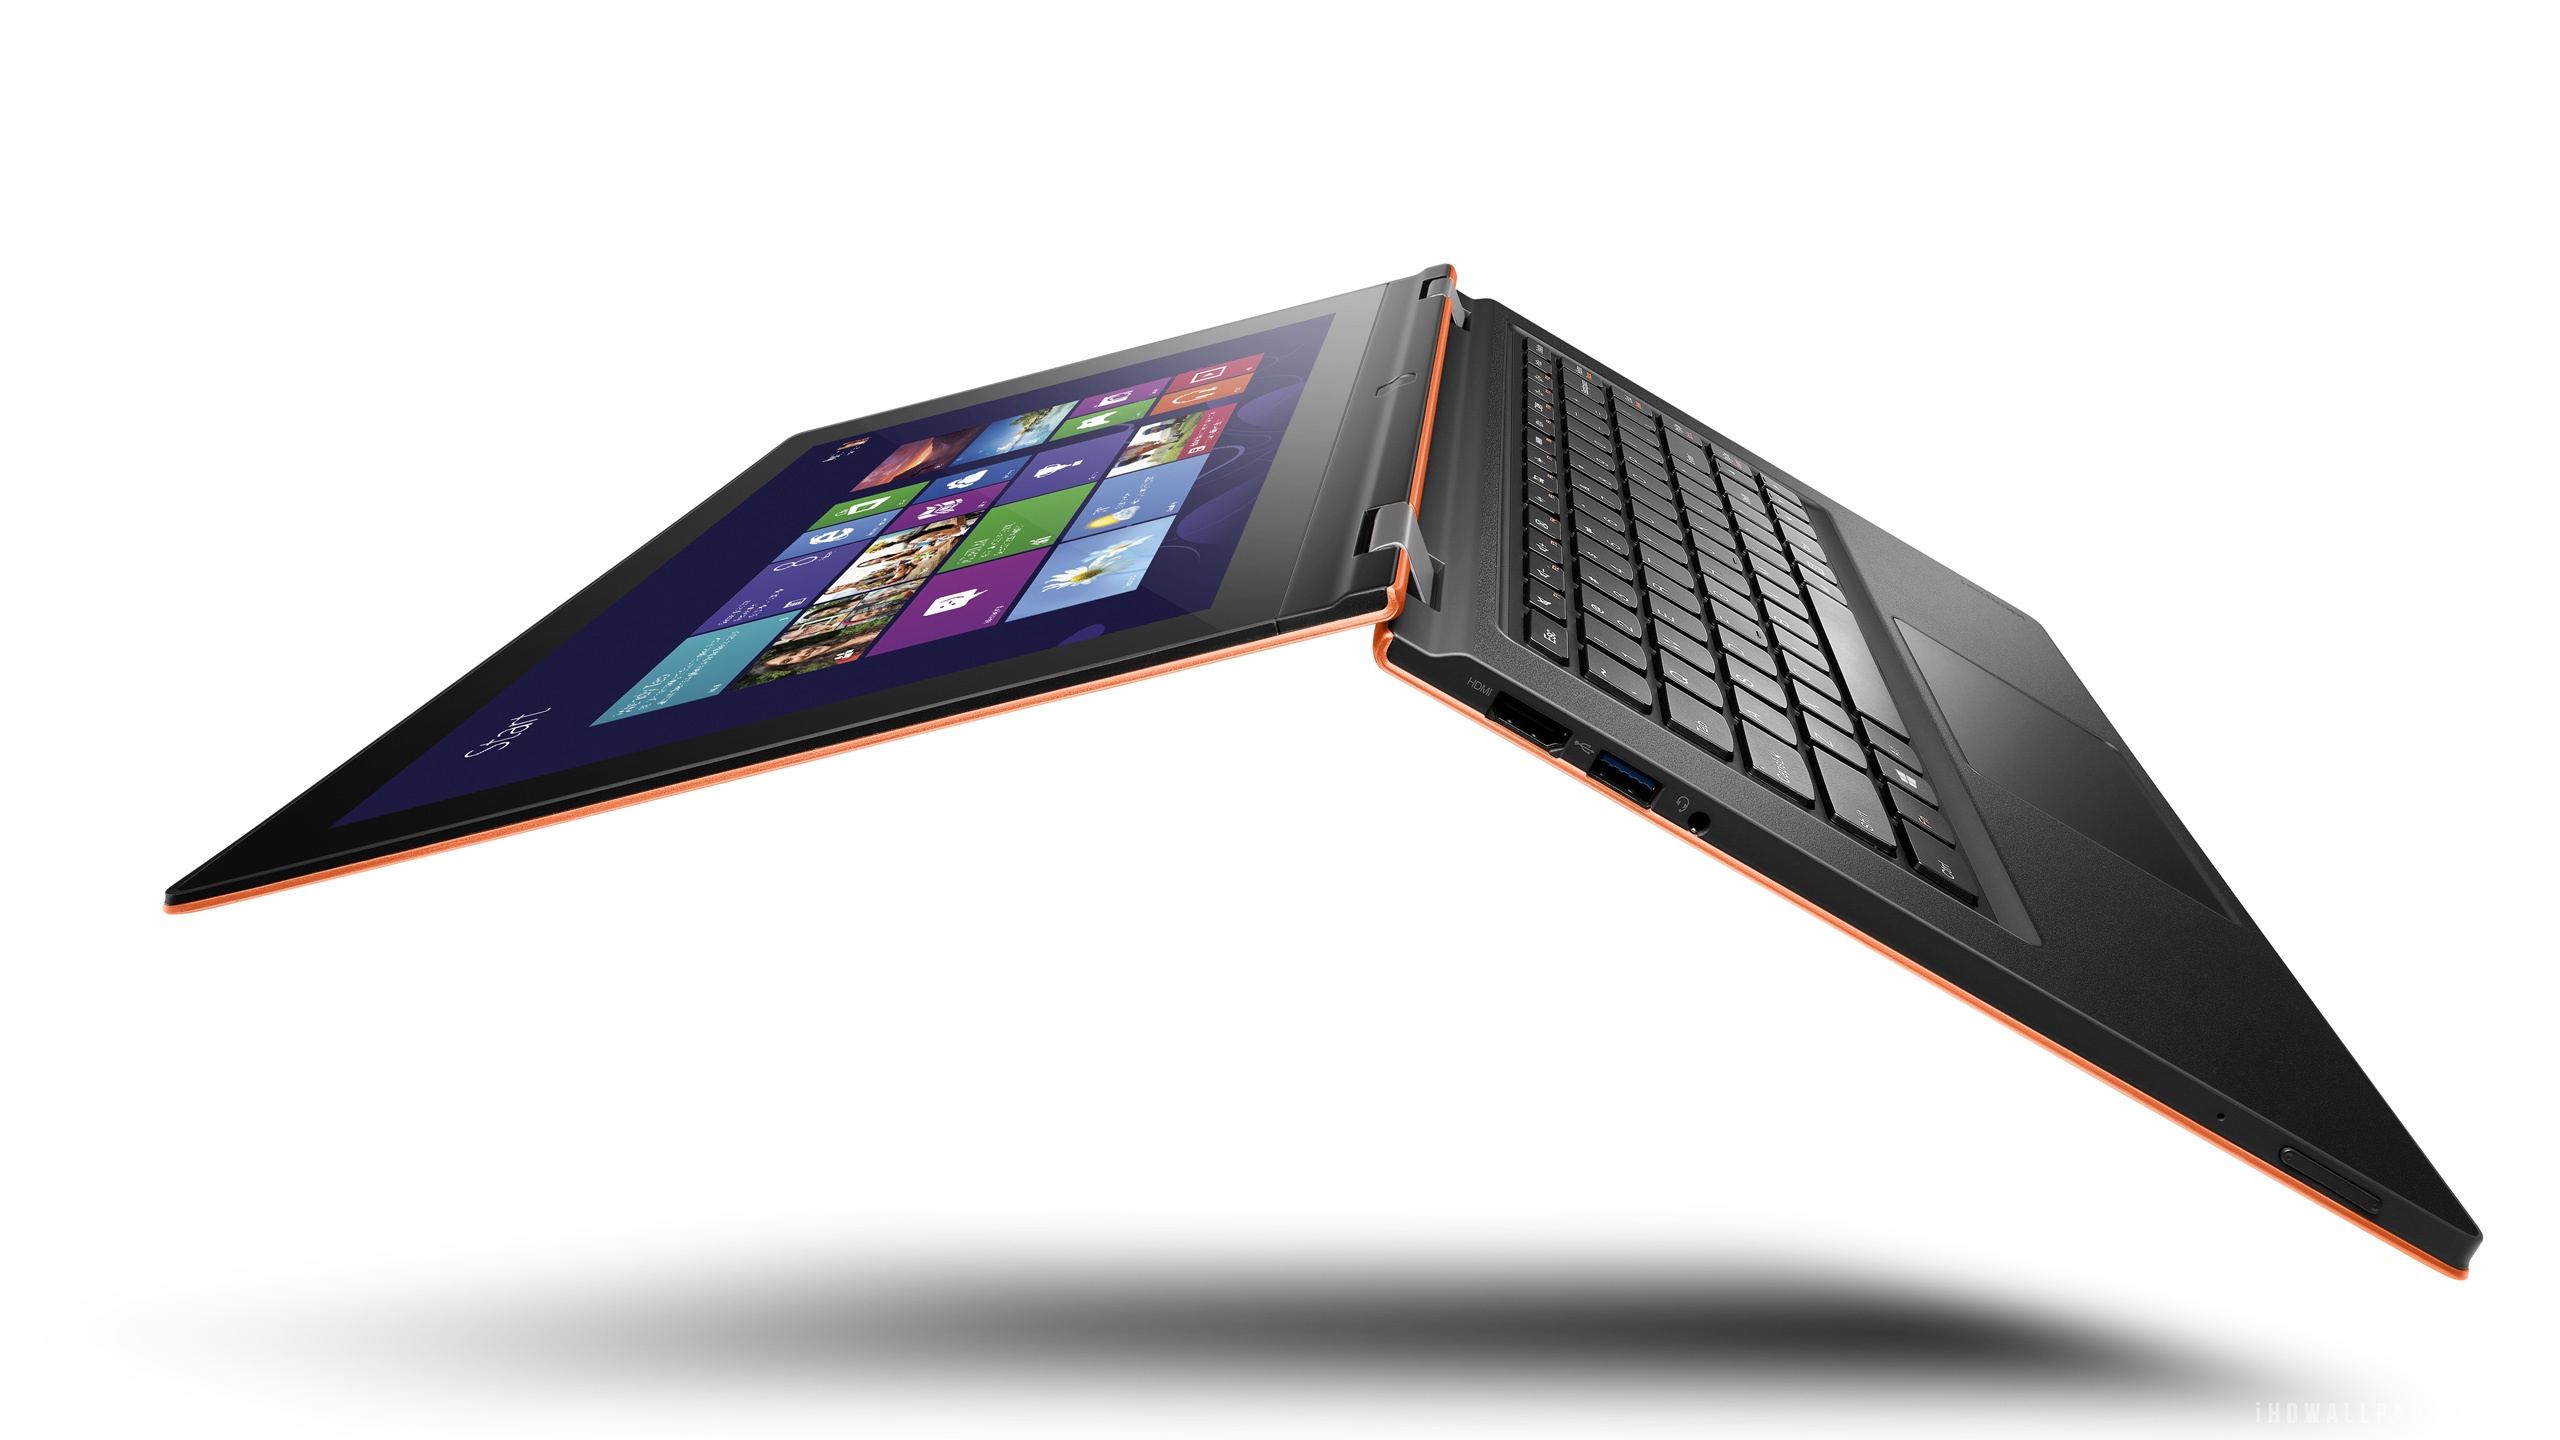 Lenovo Yoga Laptop wallpaper 1920x1200 2560x1440